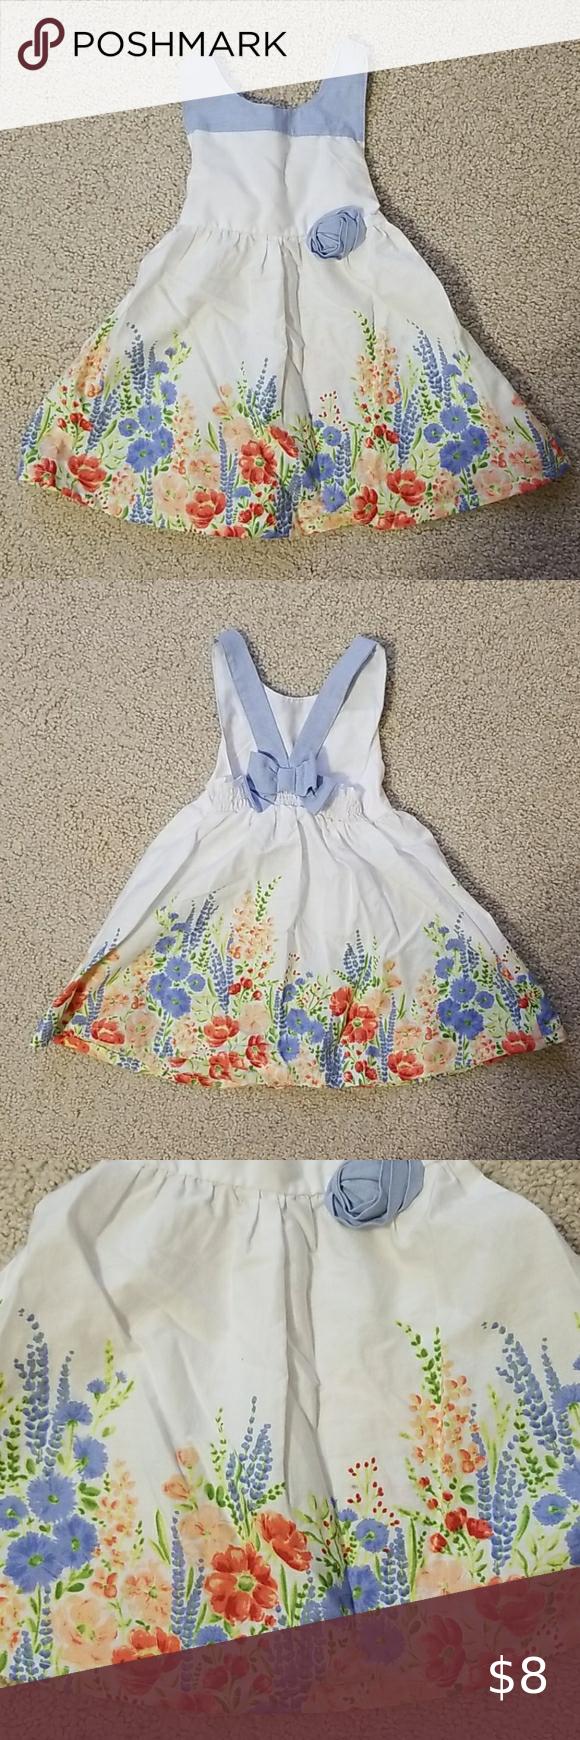 Baby Girl Summer Dress Baby Girl Summer Dresses Girls Dresses Summer Baby Girl Summer [ 1740 x 580 Pixel ]